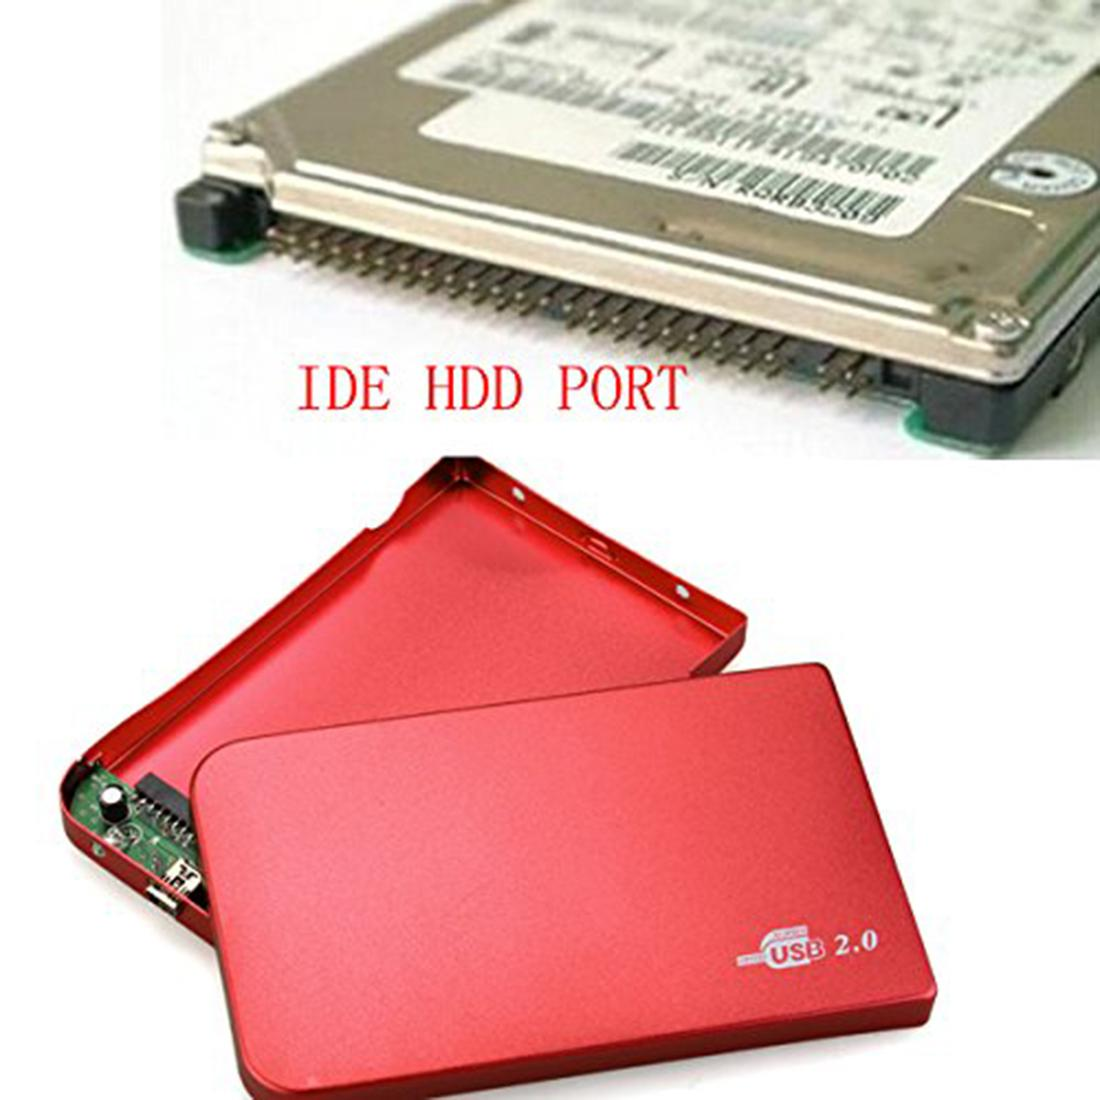 Etmakit New Fashion New Arrive Red External Hard Drive Enclosure 2.5 Inch Usb 2.0 Ide Portable Case Hdd Ultra Thin 2 5 ide usb 2 0 external hard drive enclosure case black